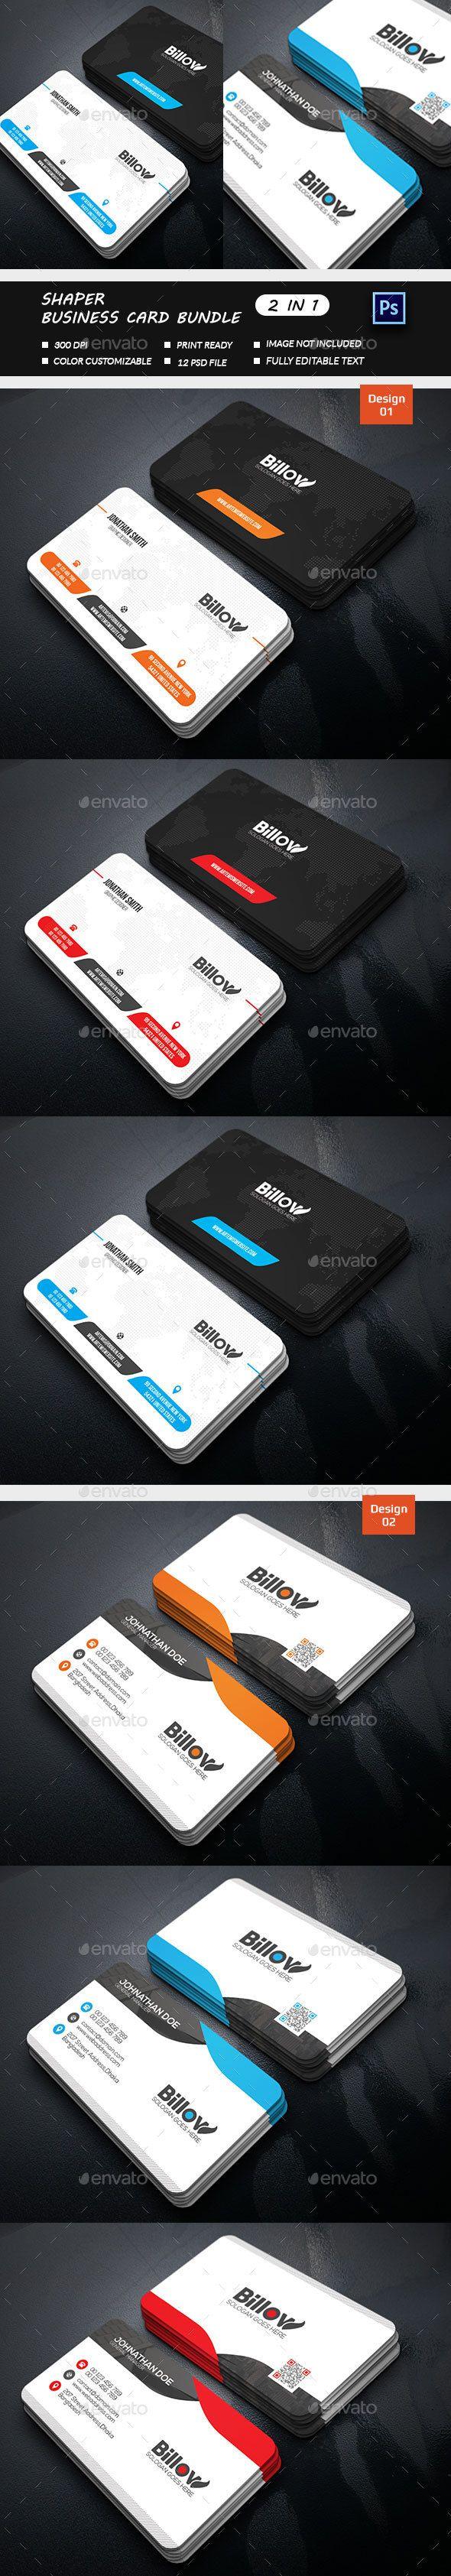 Business Card Bundle 39 best Design images